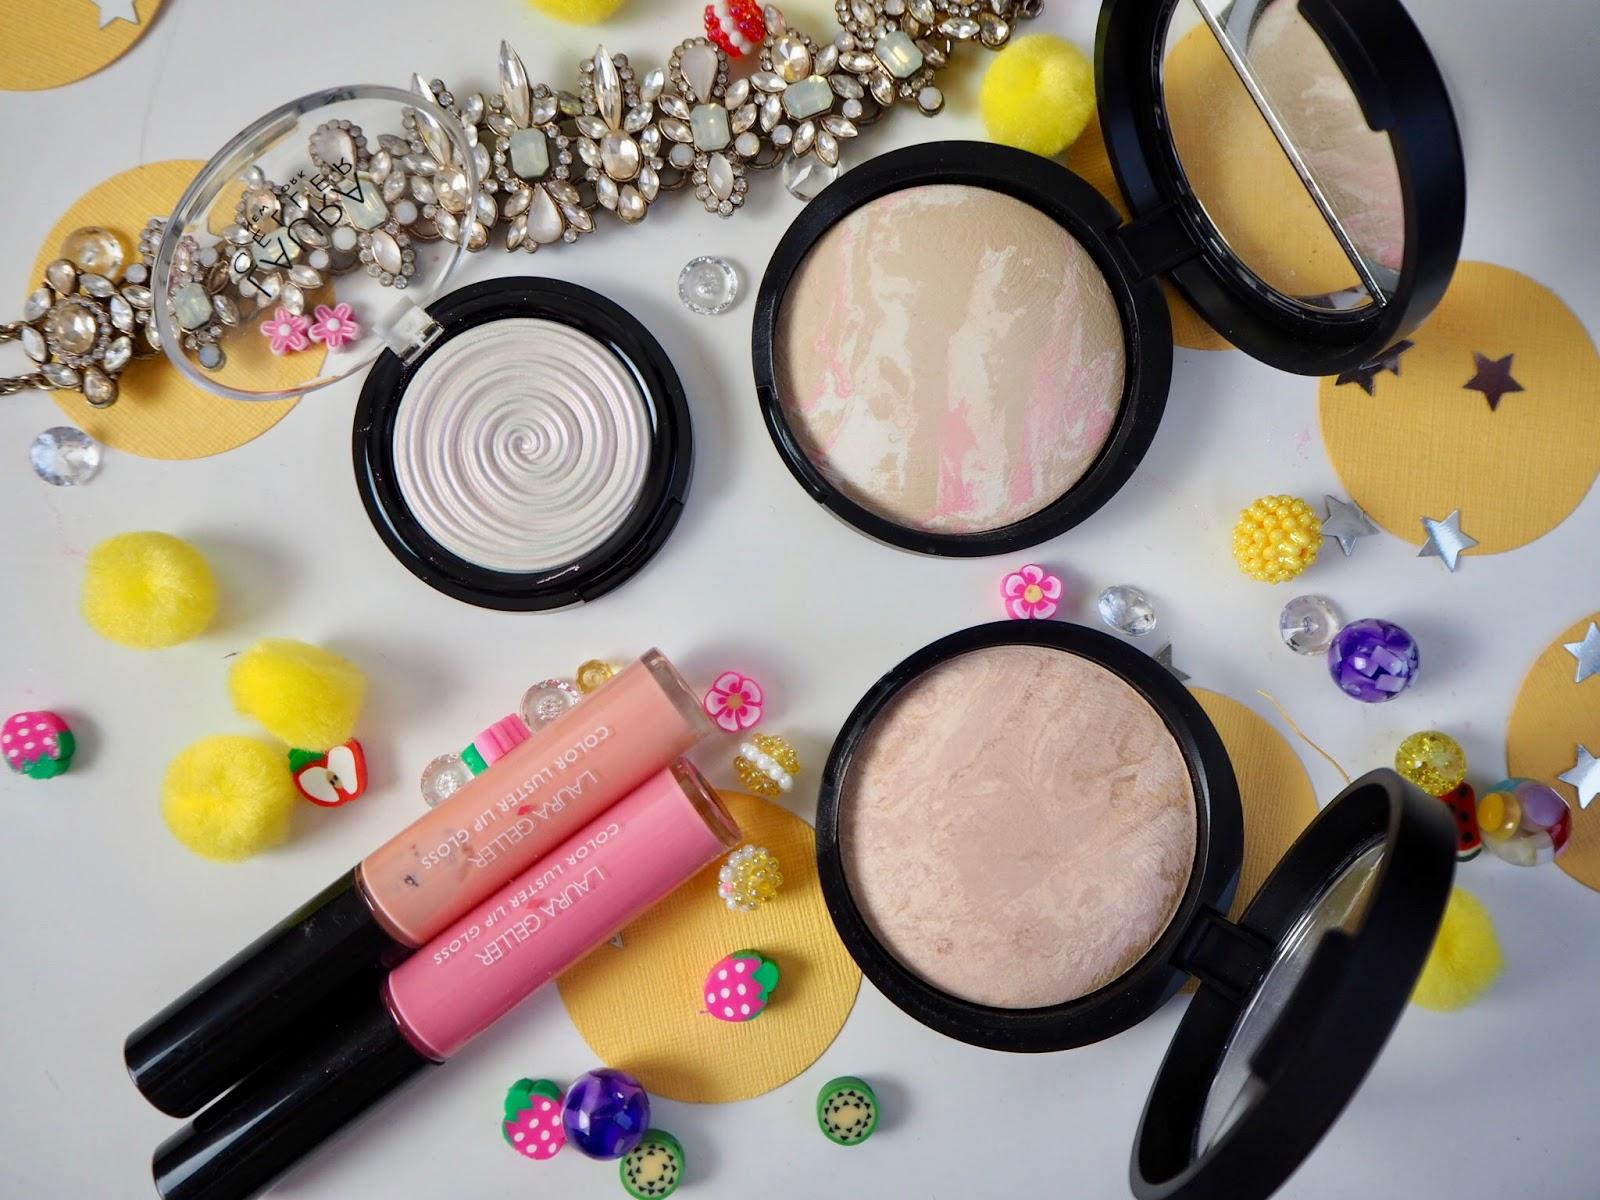 The Best Of: Laura Geller* Color Lustre Lip Glosses, Diamond Dust Baked Gelato Illuminator, Balance and Brighten Powder Foundation